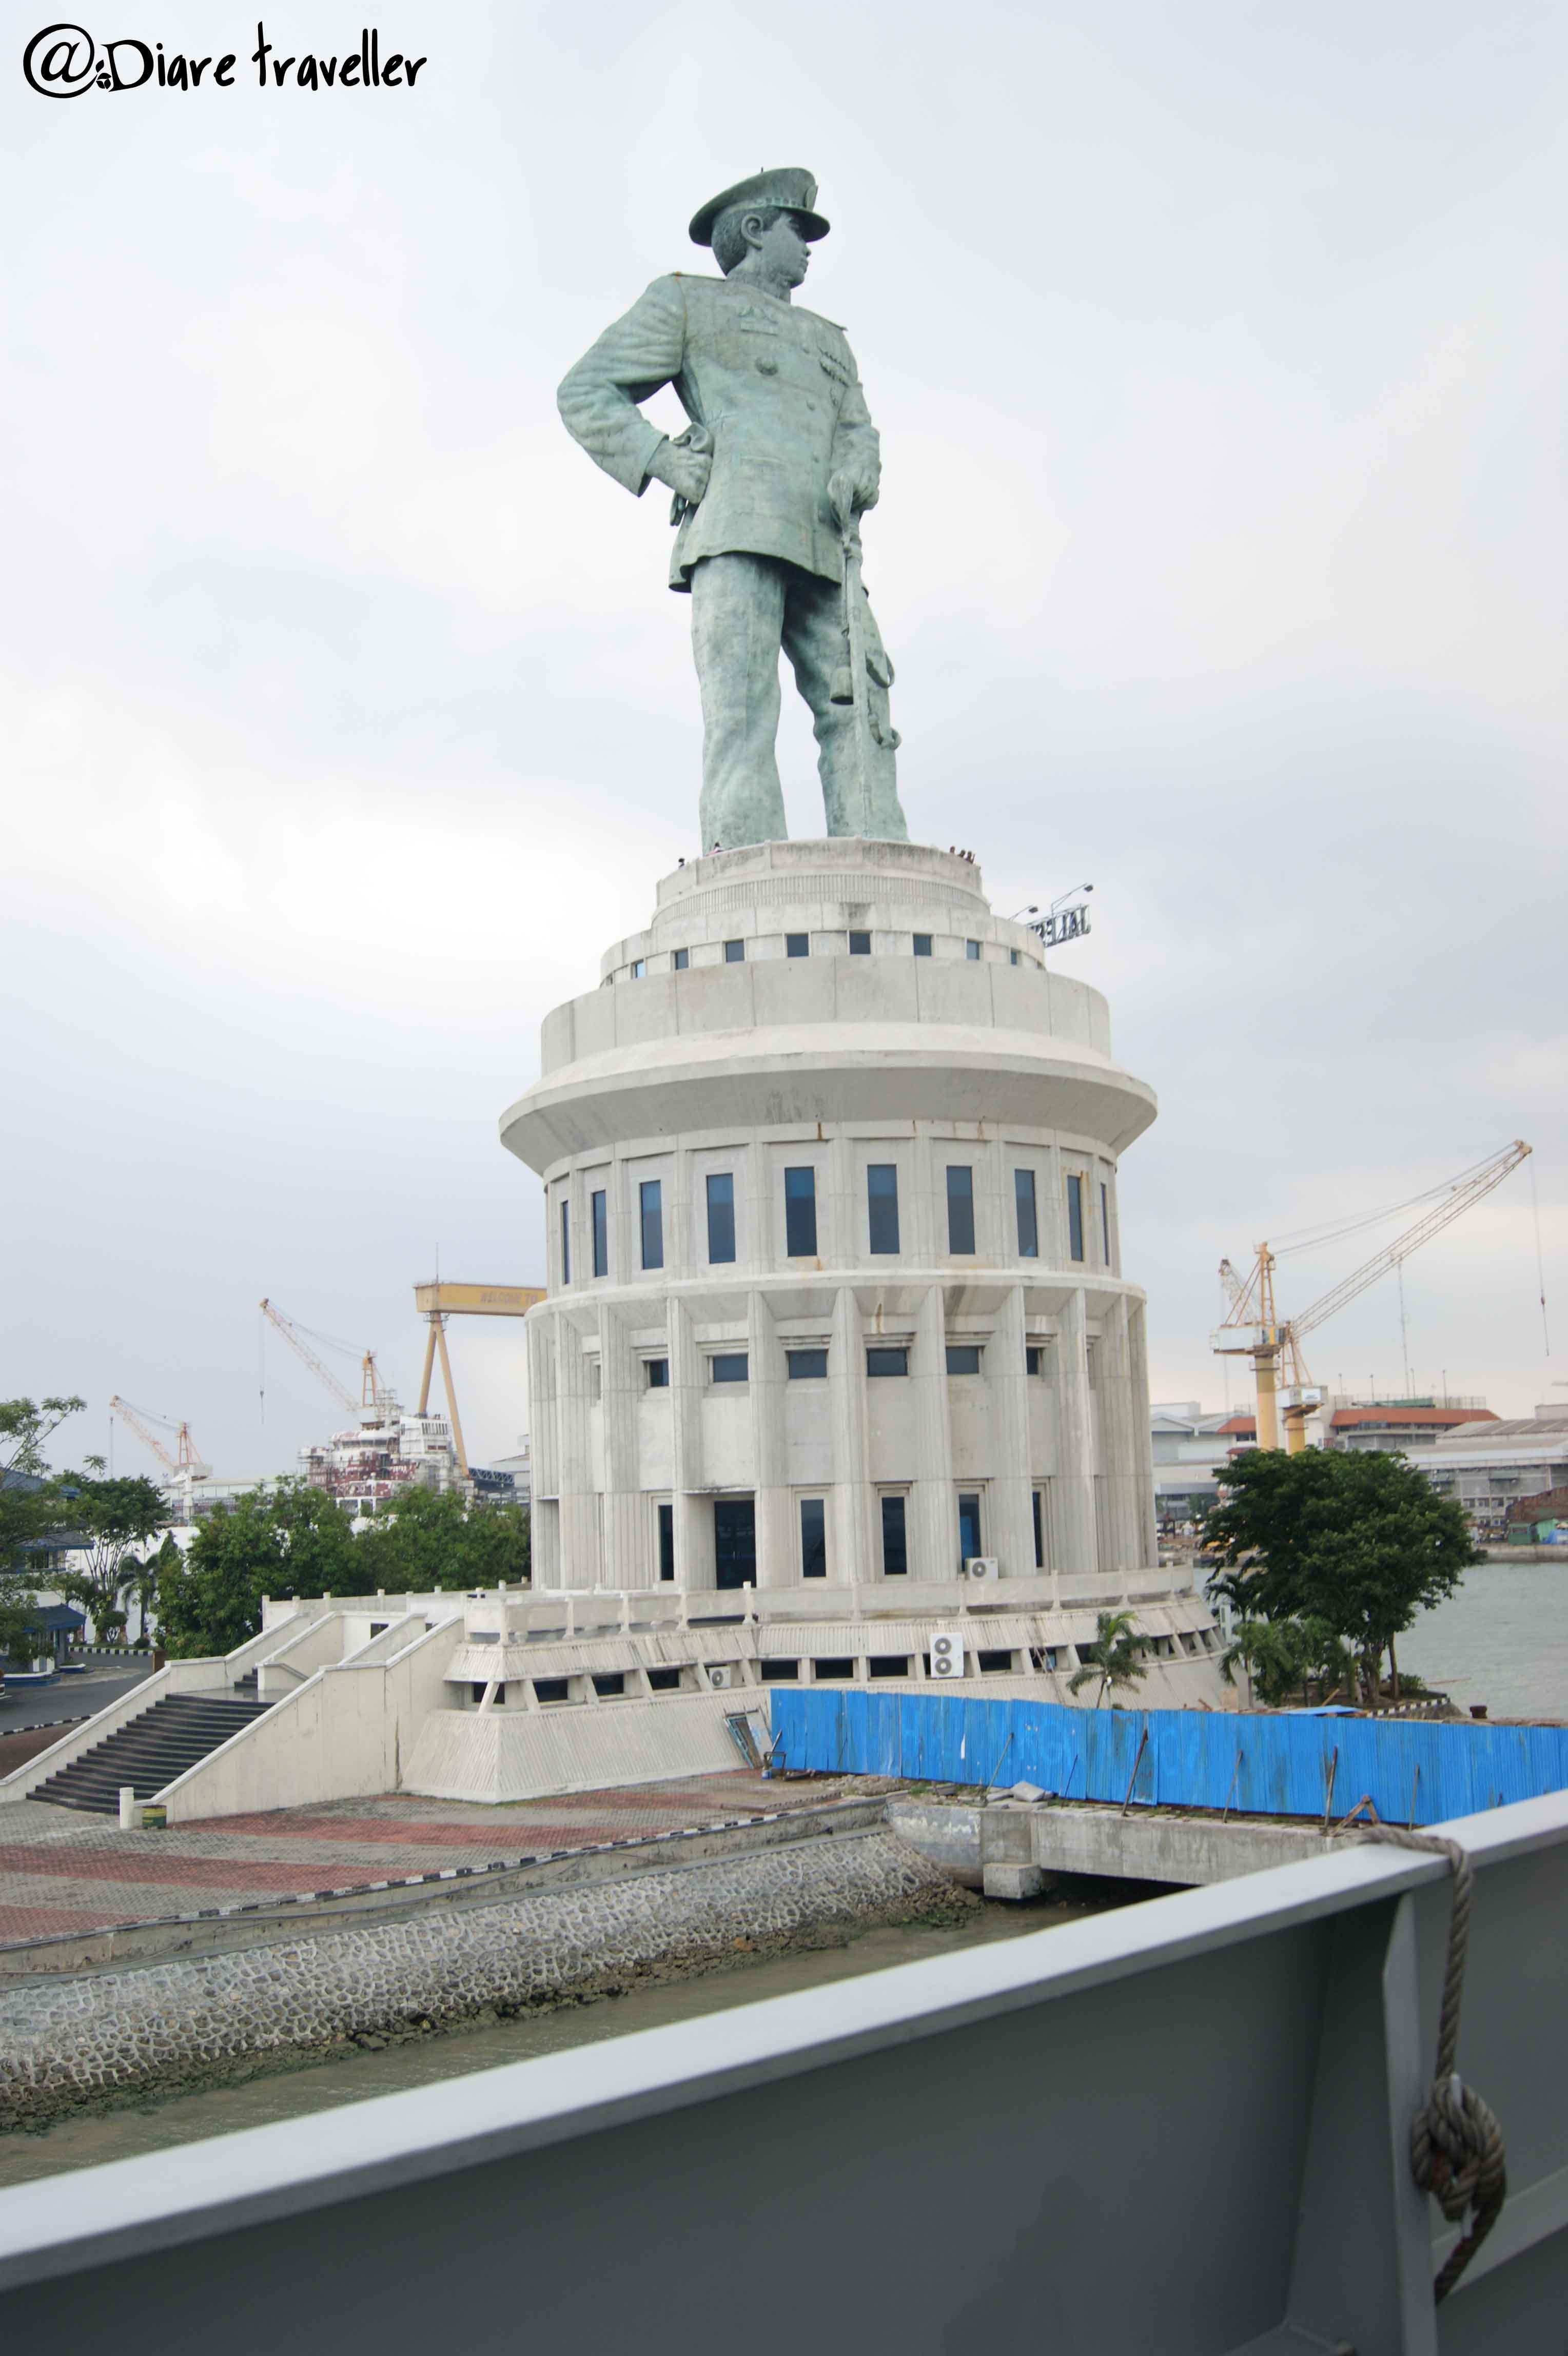 Monumen Jalesveva Jayamahe Eiffel Surabaya Diare Photography Sony Dsc Kota